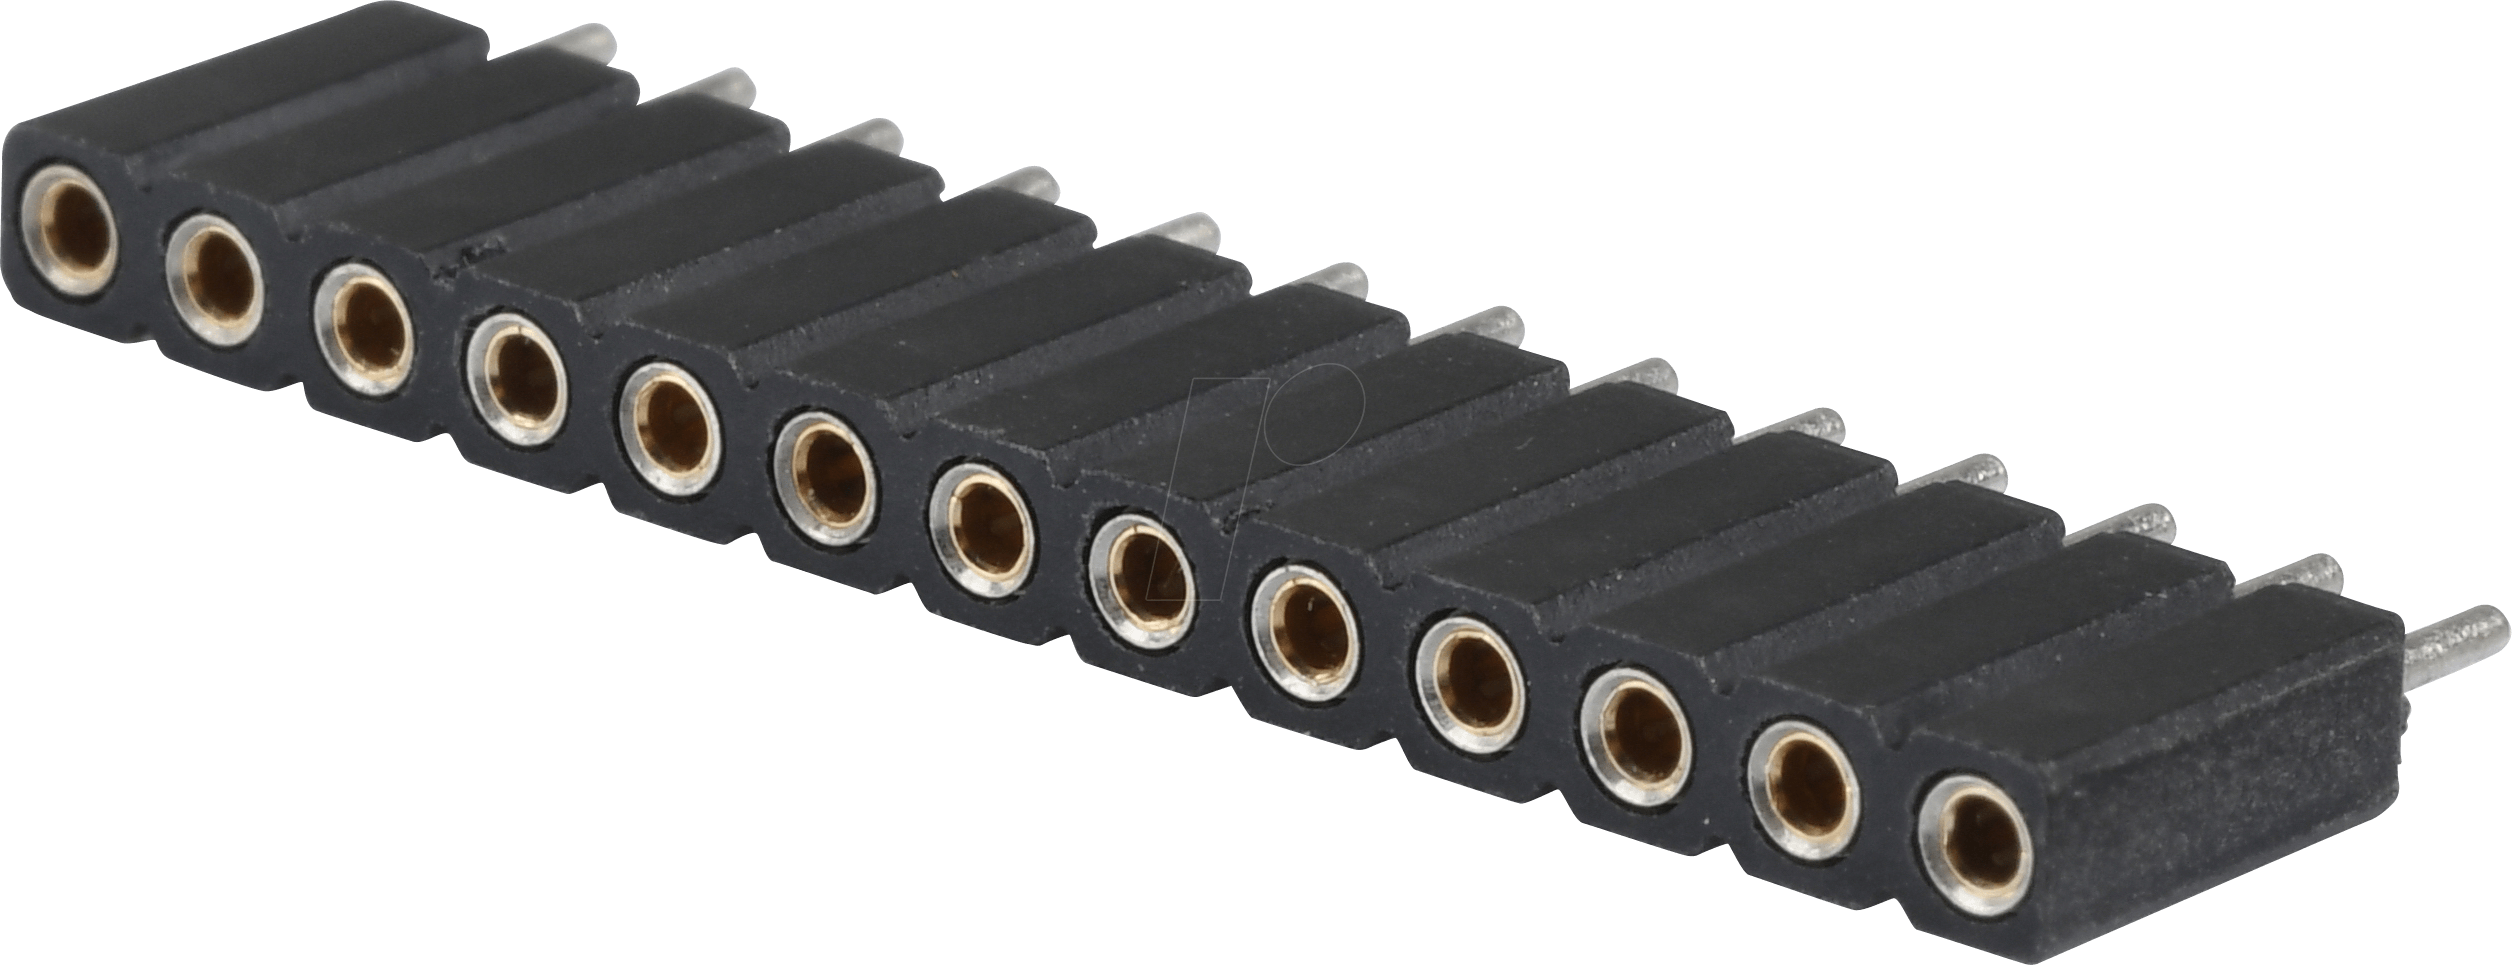 MPE 115-1-013 - Präz.-Buchsenleisten 2,54 mm, 1X13, gerade